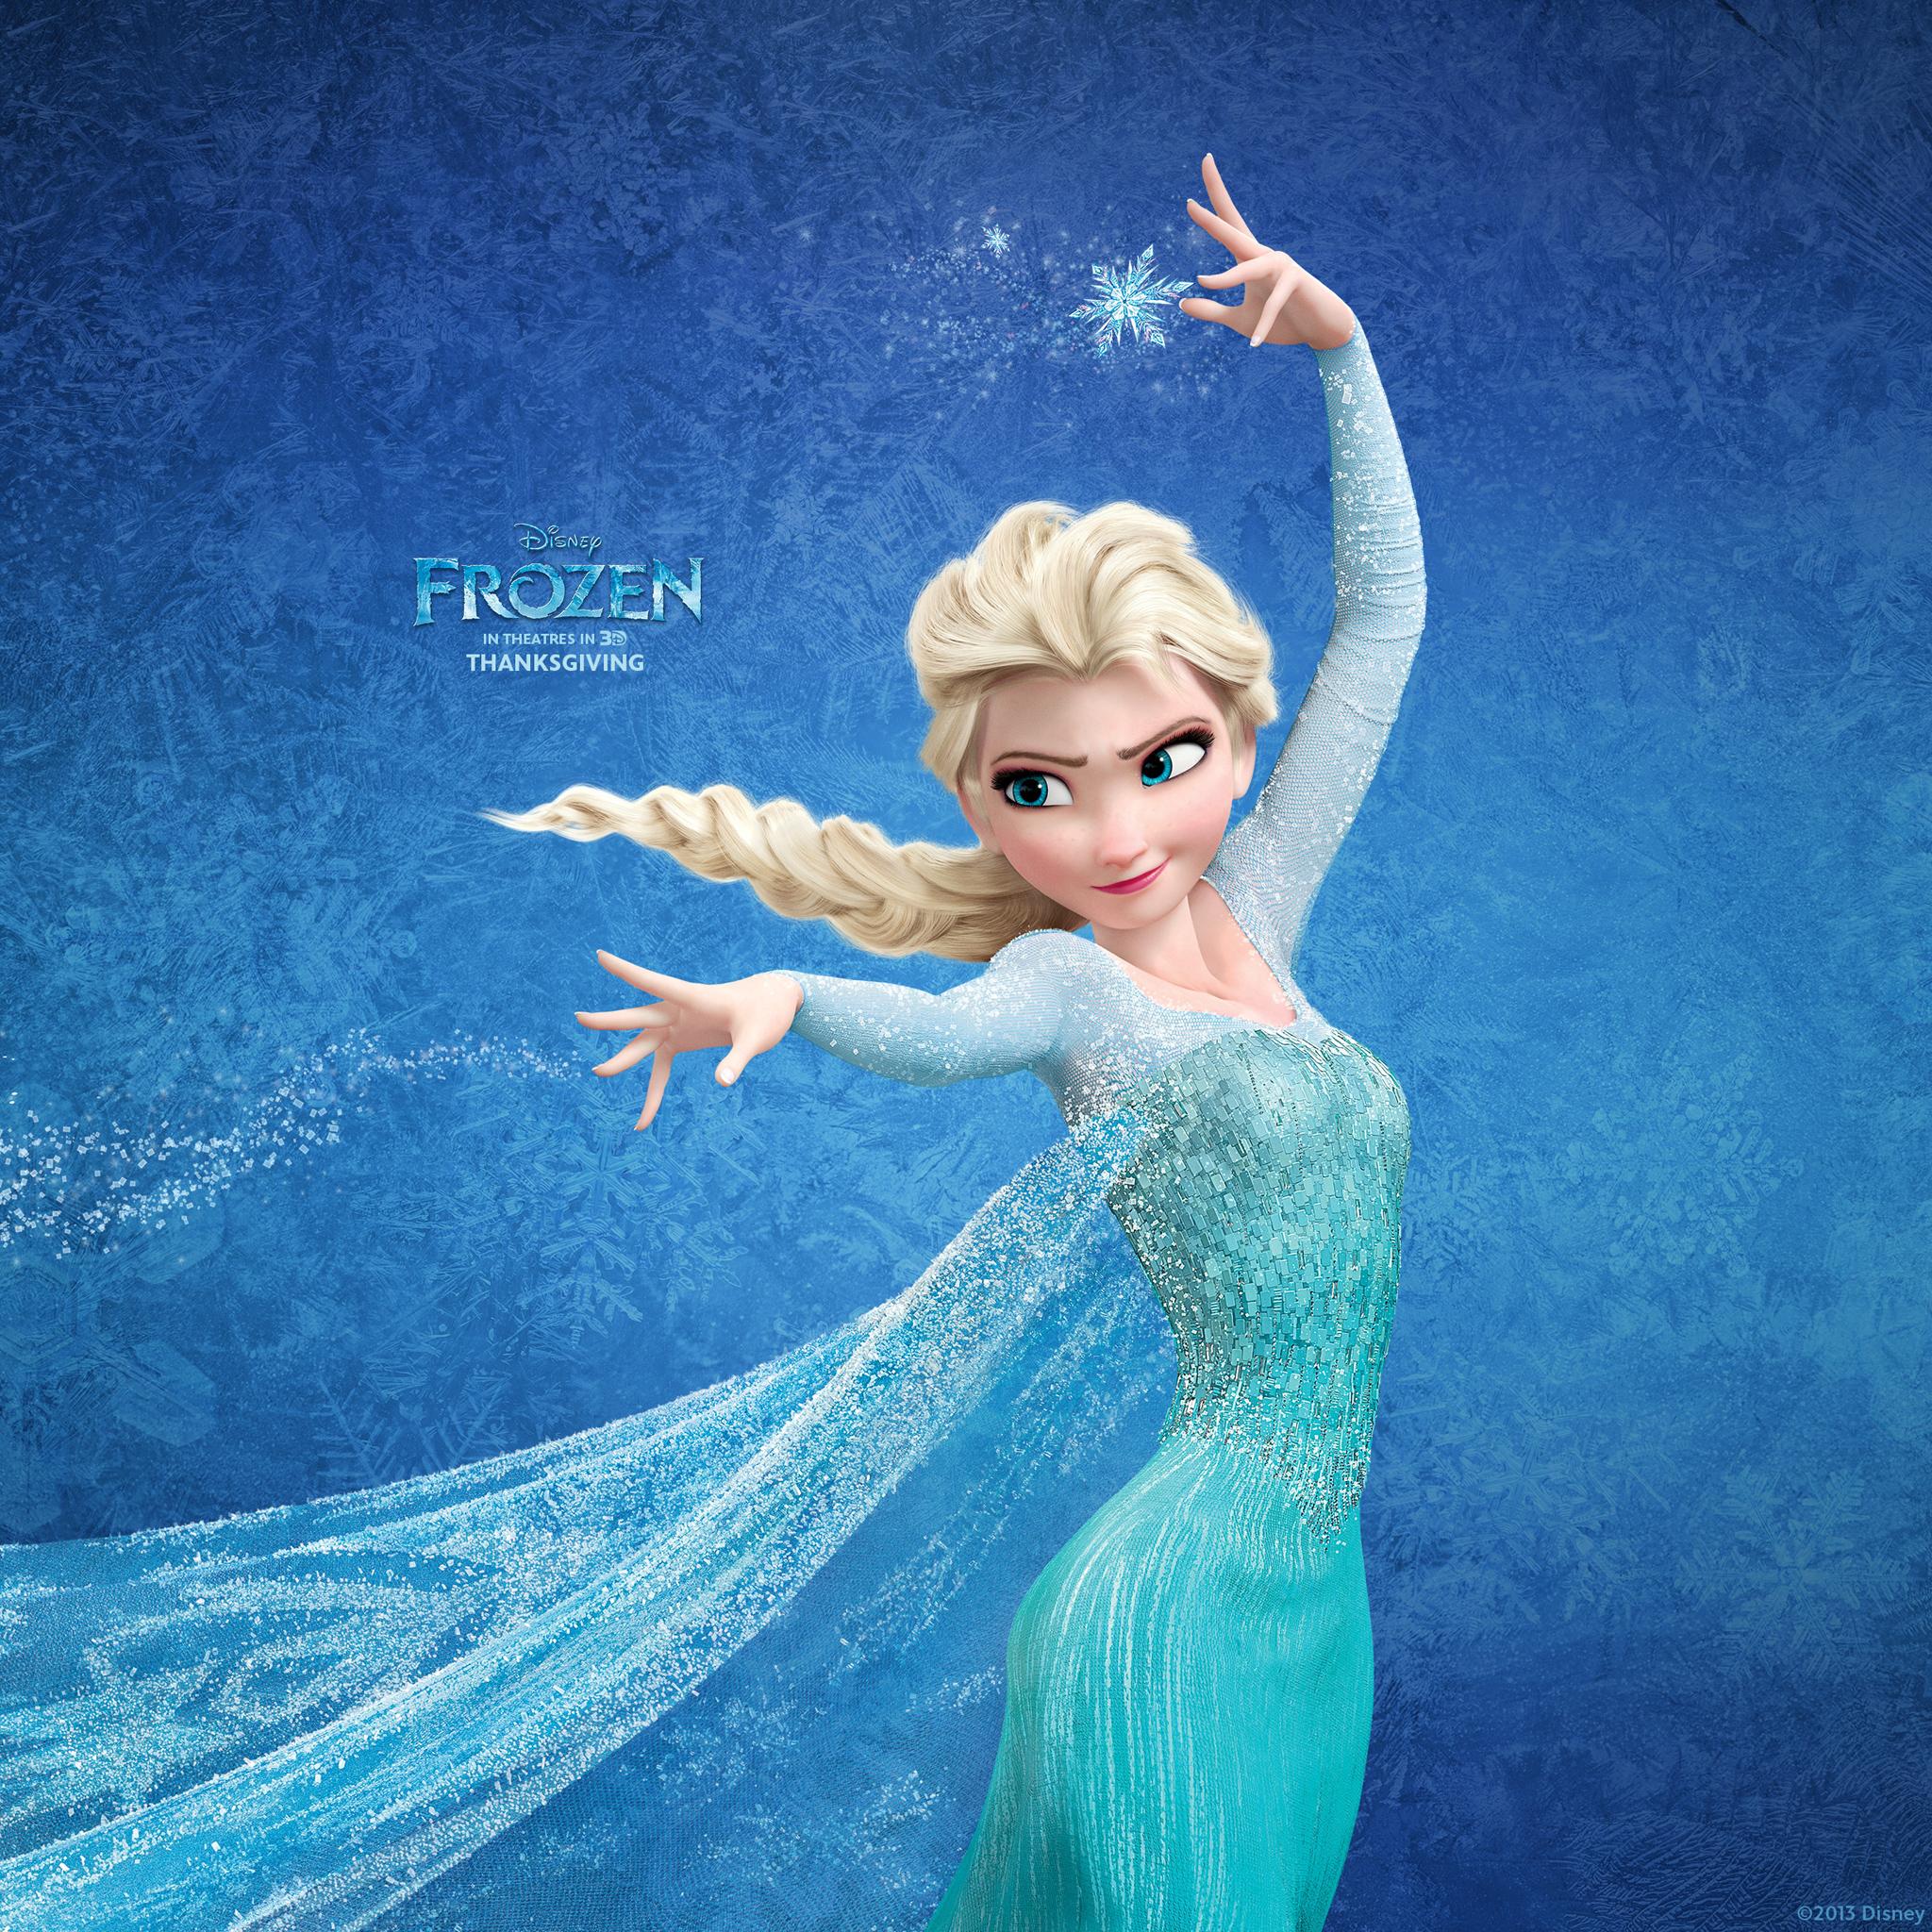 Queen Elsa Frozen Movie Wallpaper in High Resolution at Cartoons 2048x2048